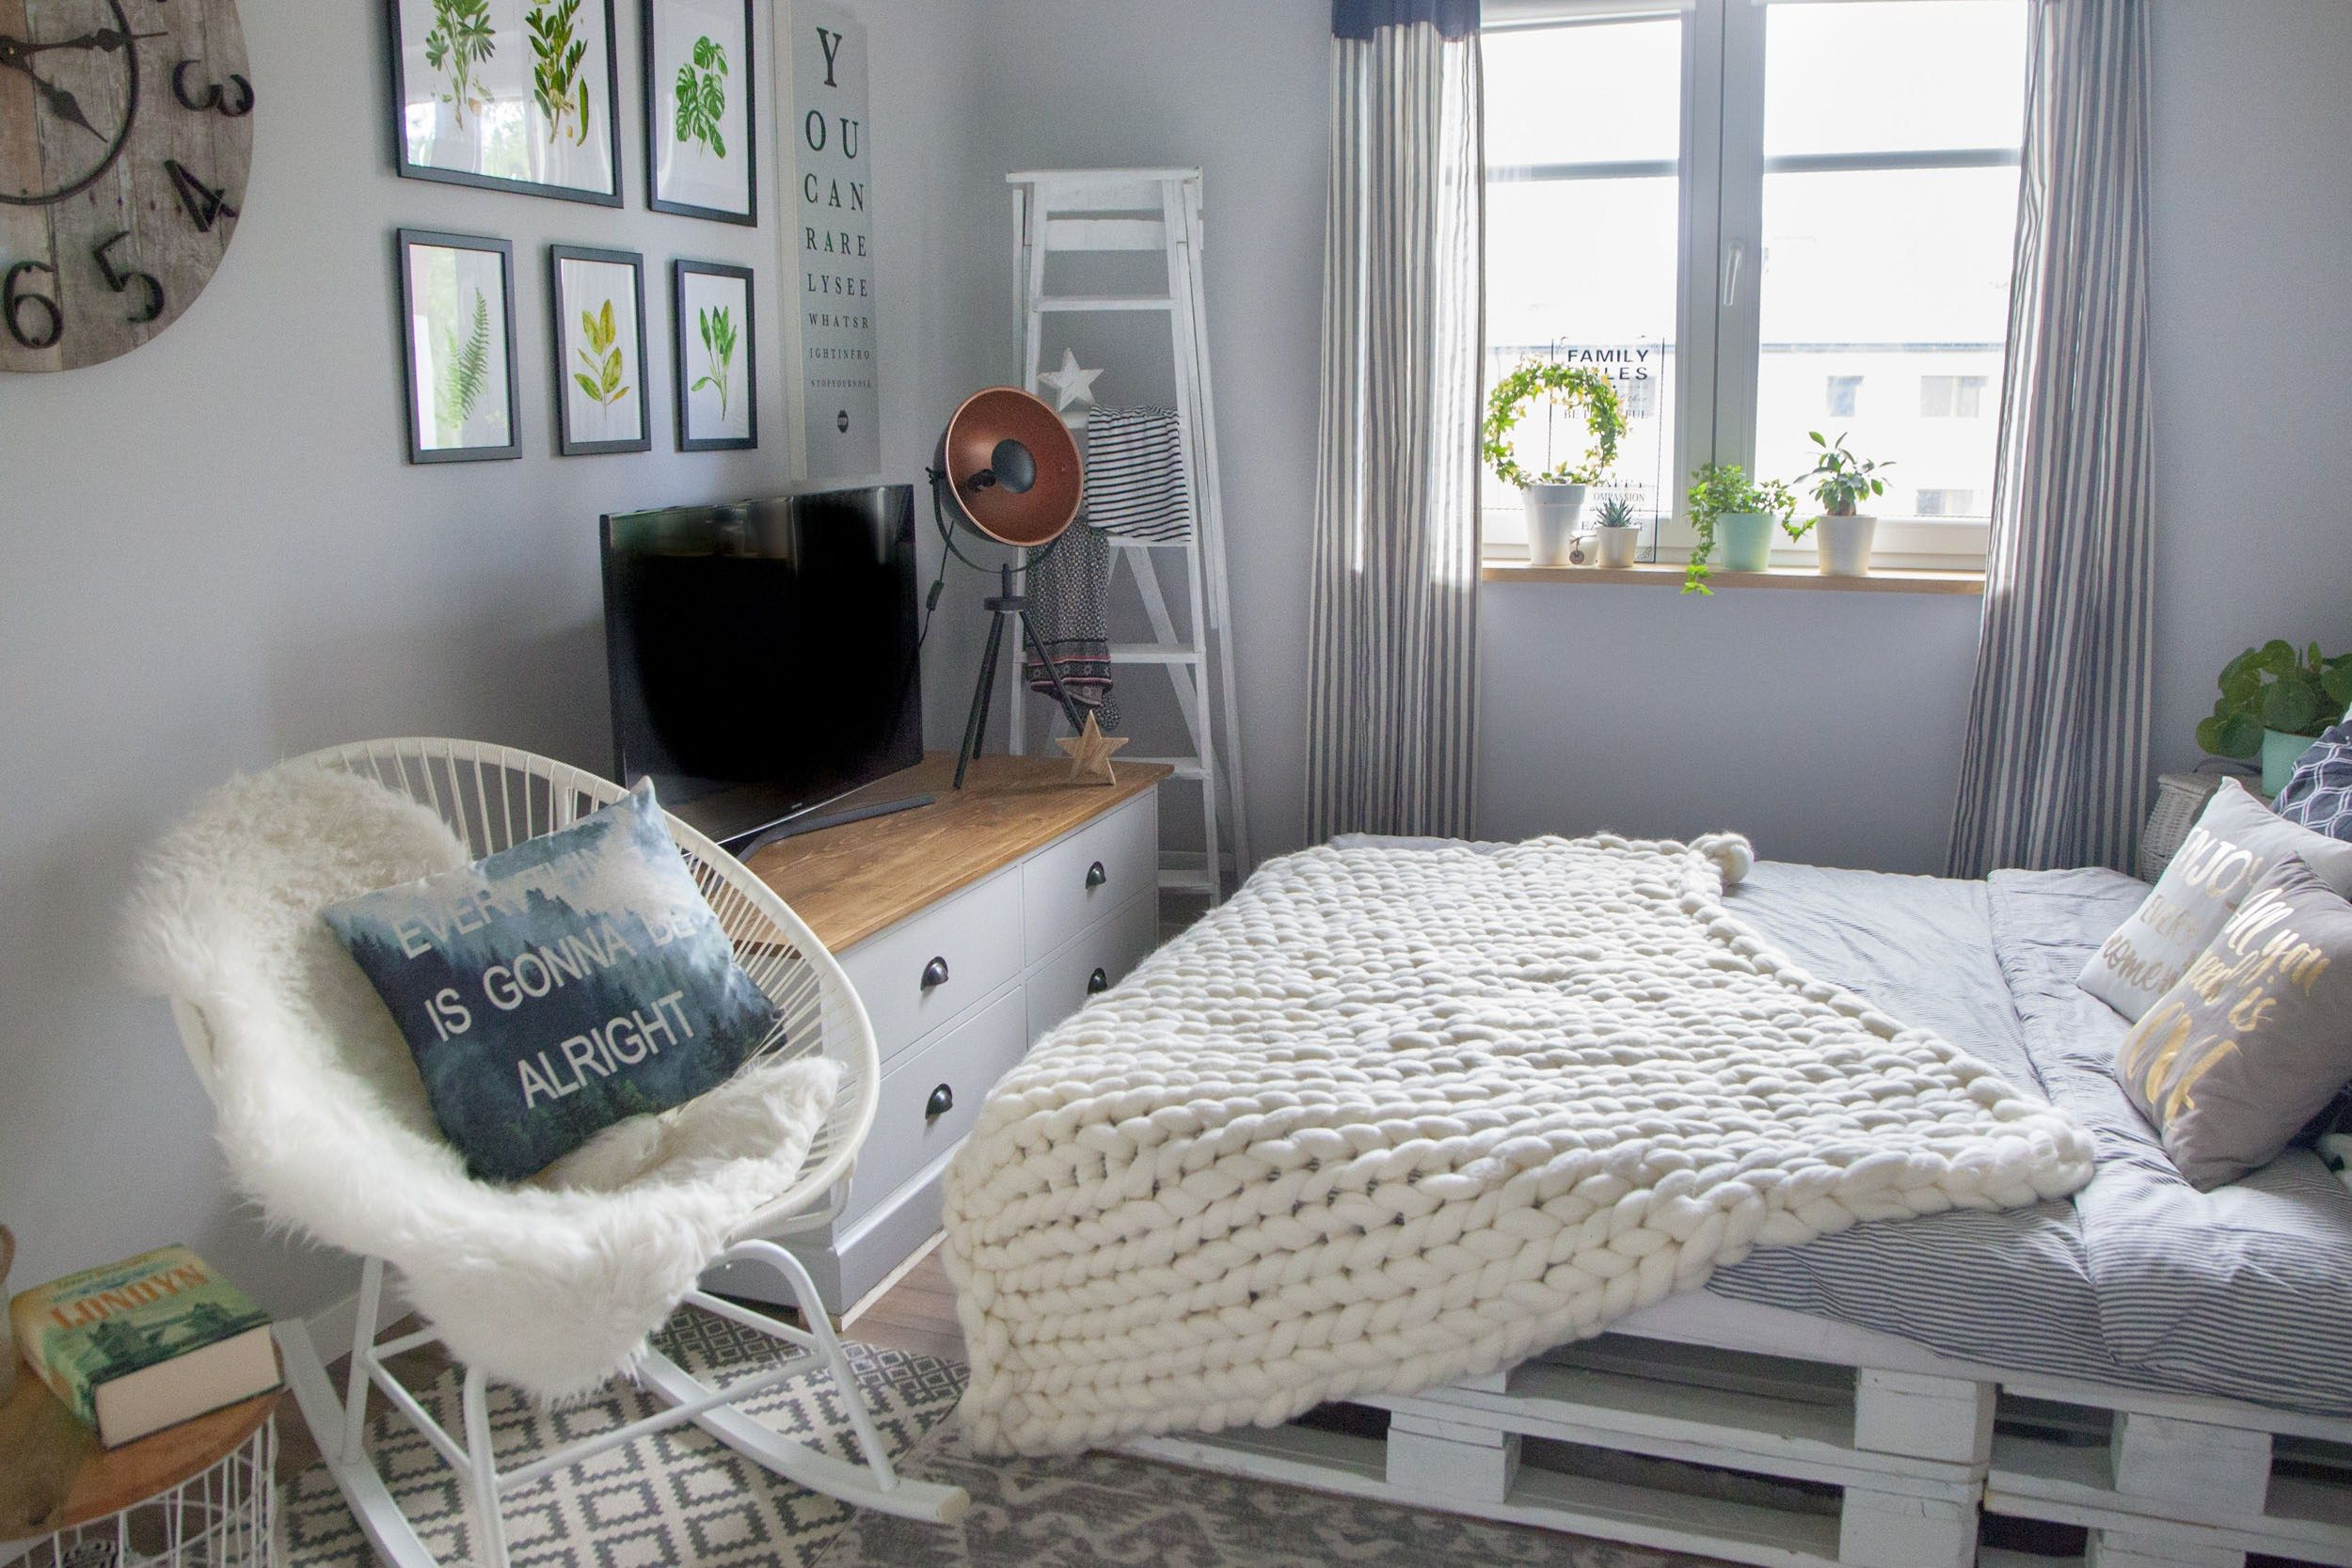 Lozko Z Palet W Sypialni Z Motywem Botanicznym Room Decor Bedroom Room Inspiration Room Decor